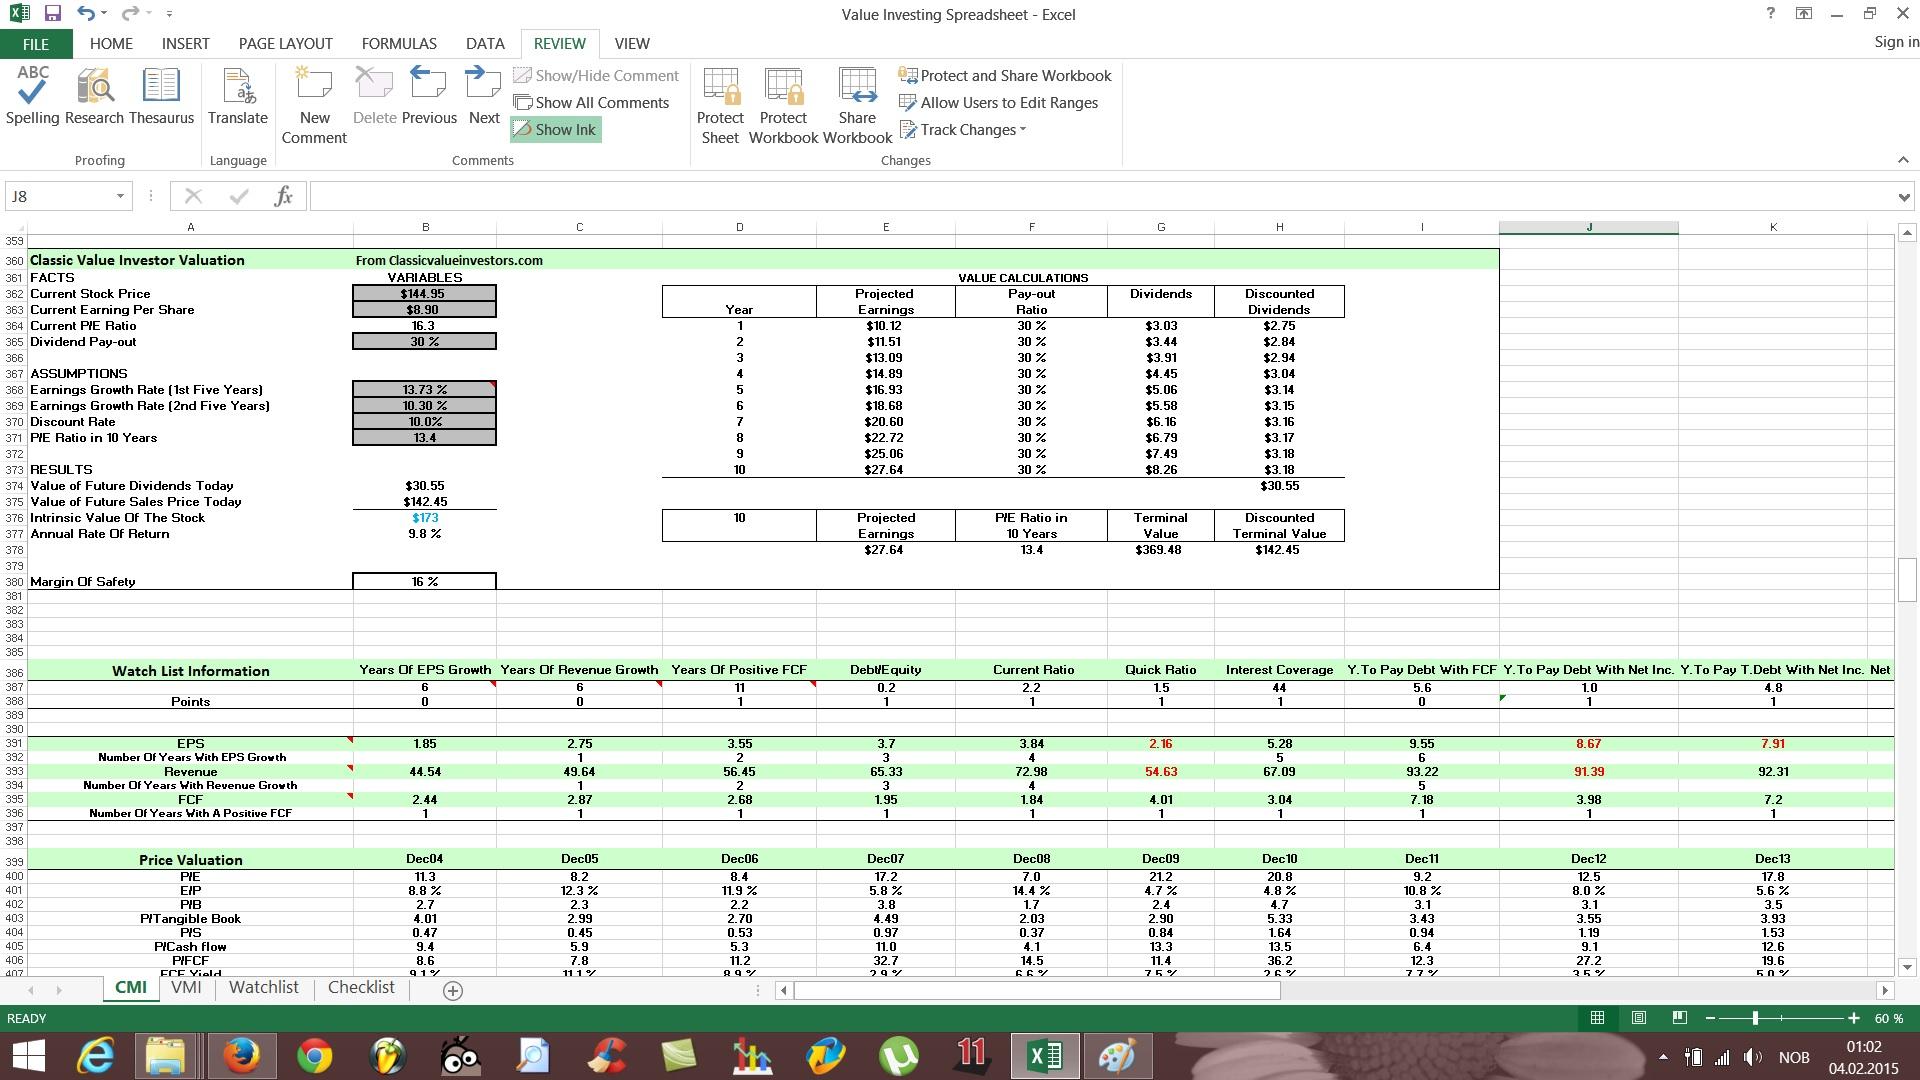 Stock Valuation Spreadsheet Regarding Free Value Investing Stock Spreadsheet